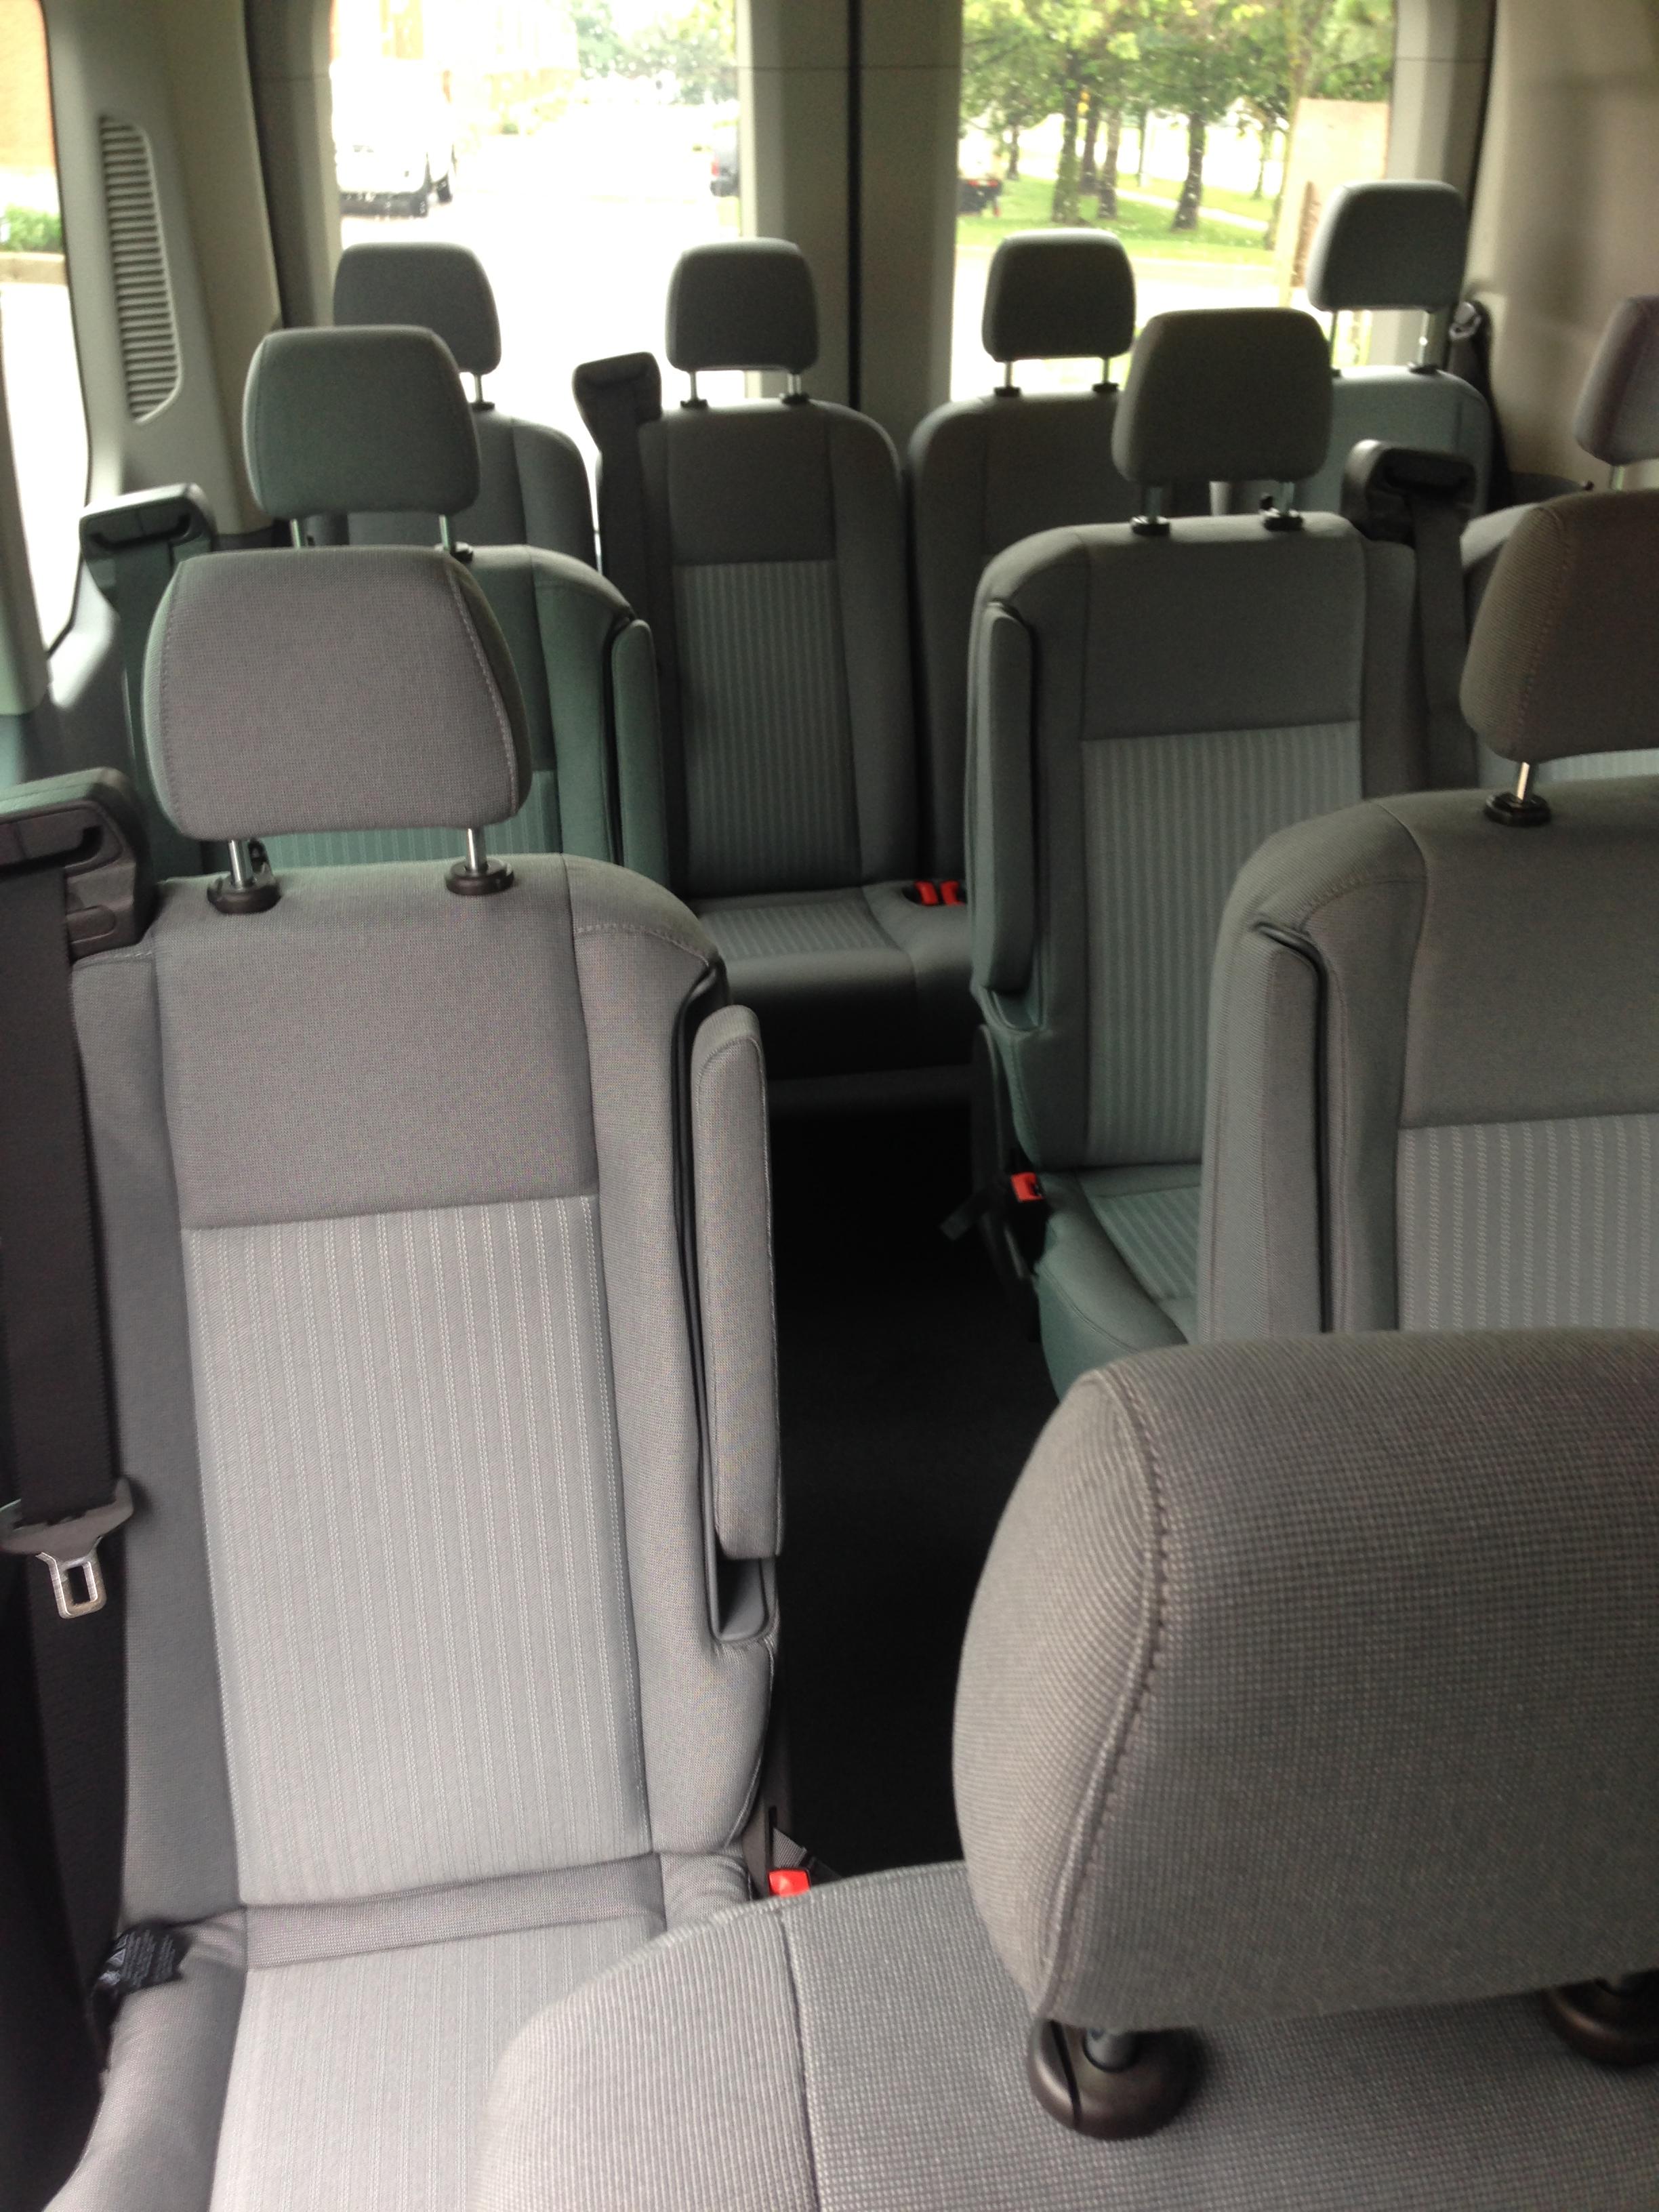 bristol car and truck rentals new ford transit passenger vans are in june 12 2015. Black Bedroom Furniture Sets. Home Design Ideas